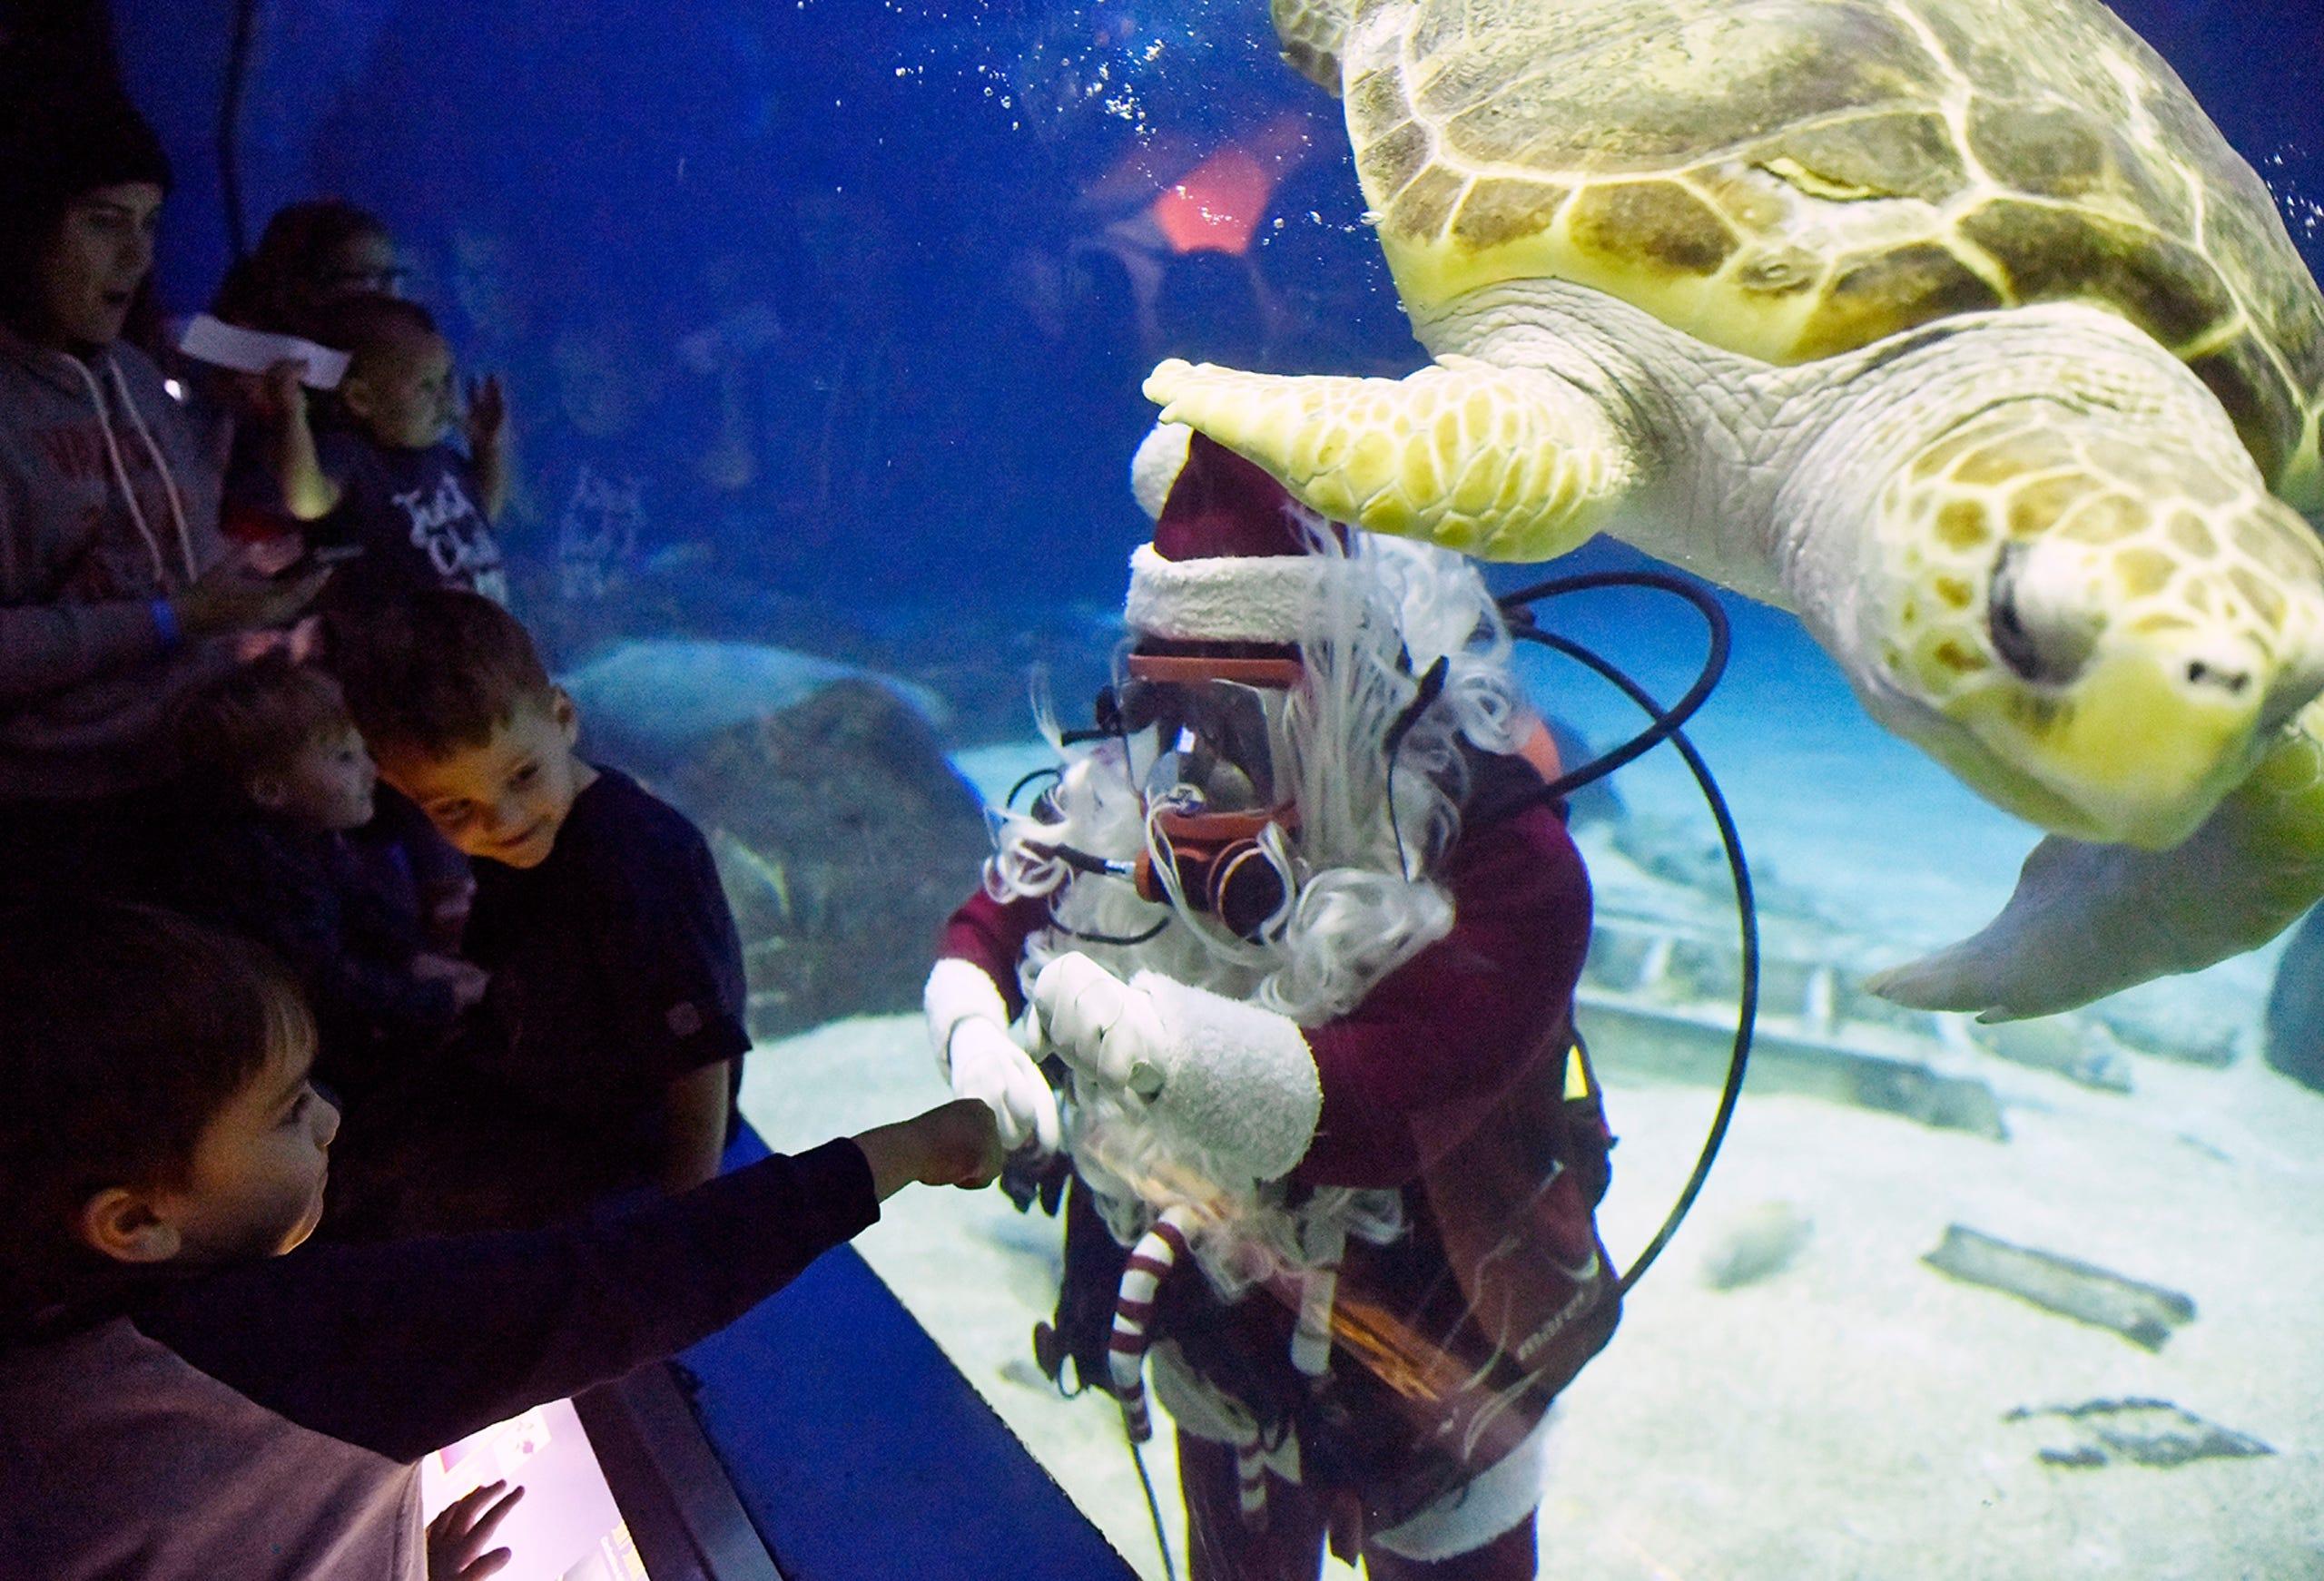 PHOTOS: Scuba Santa takes a swim at